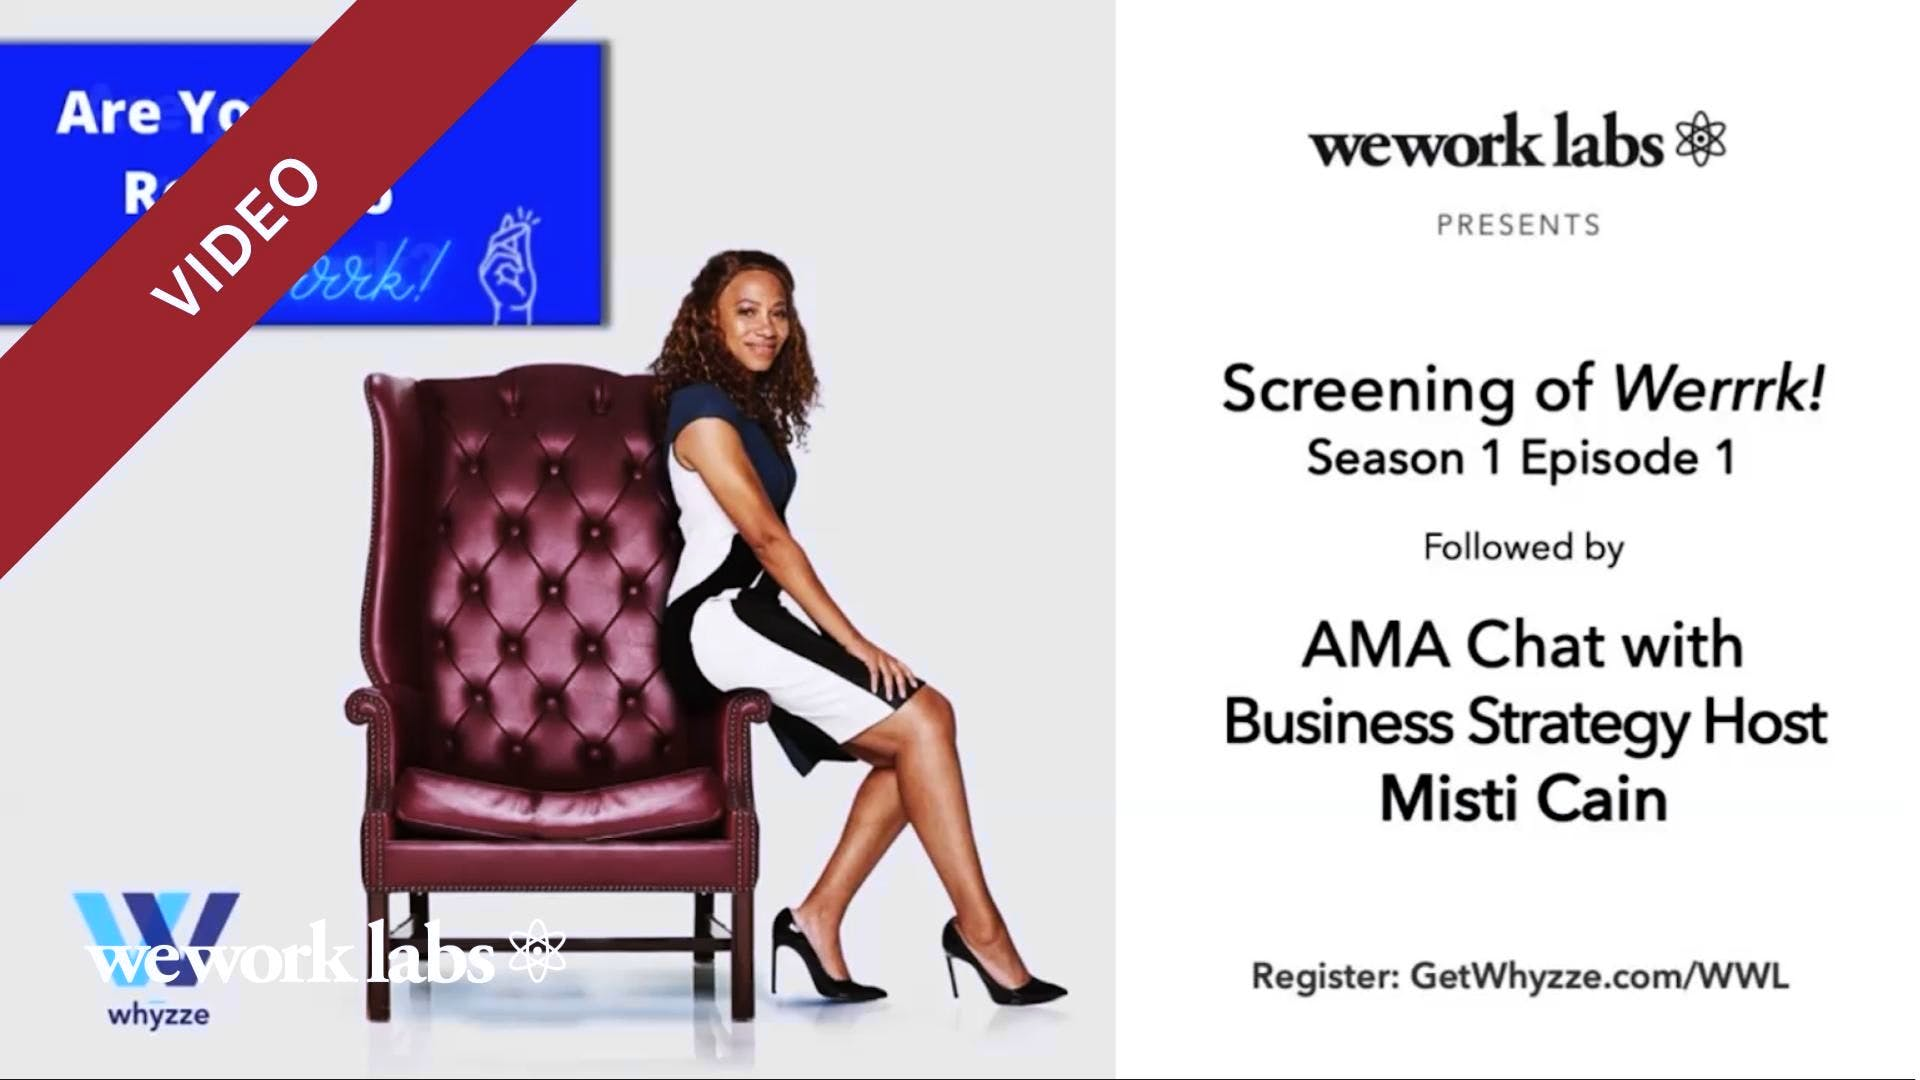 Misti Cain AMA, host of Business Reality Show, Werrrk!